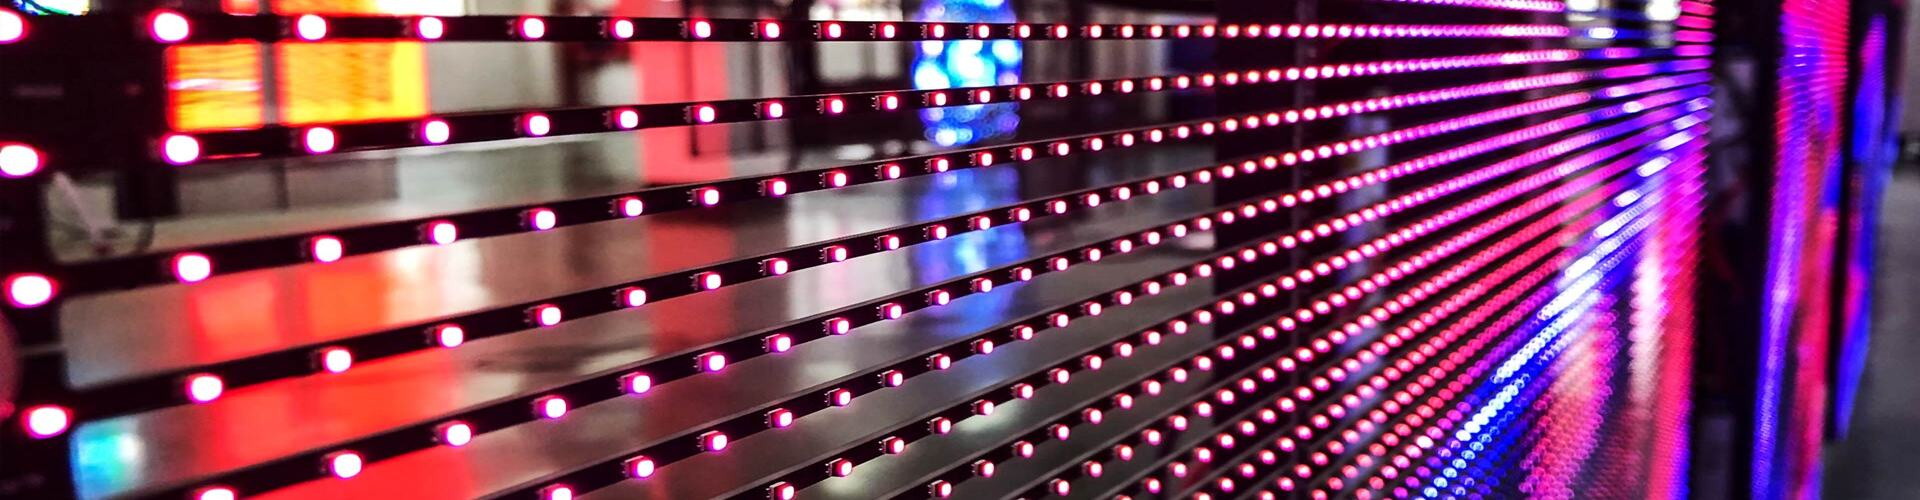 Transparent Glass LED Display